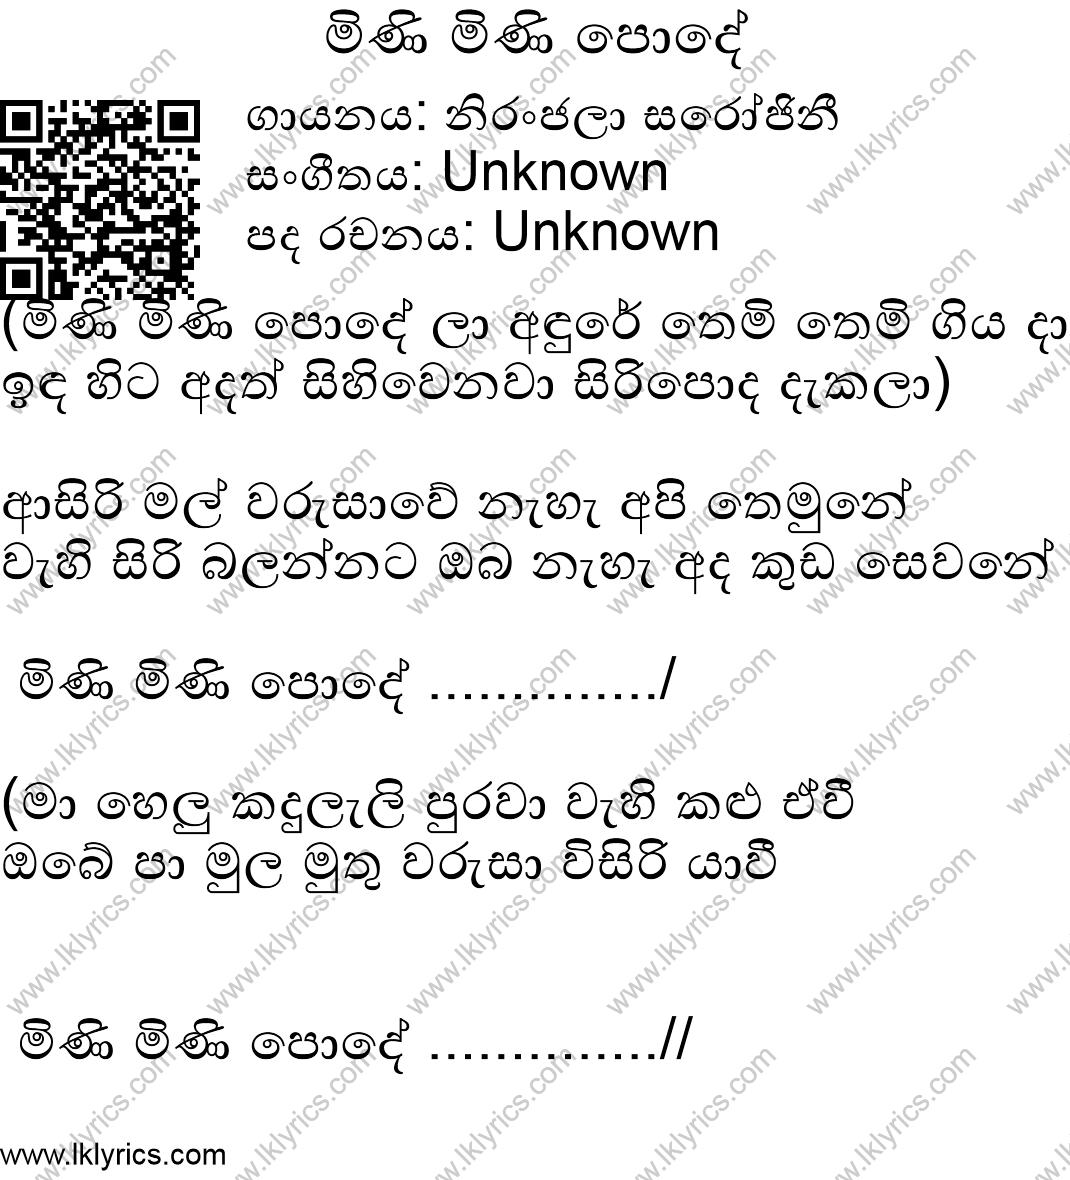 Mini Mini Pode Lyrics Lk Lyrics